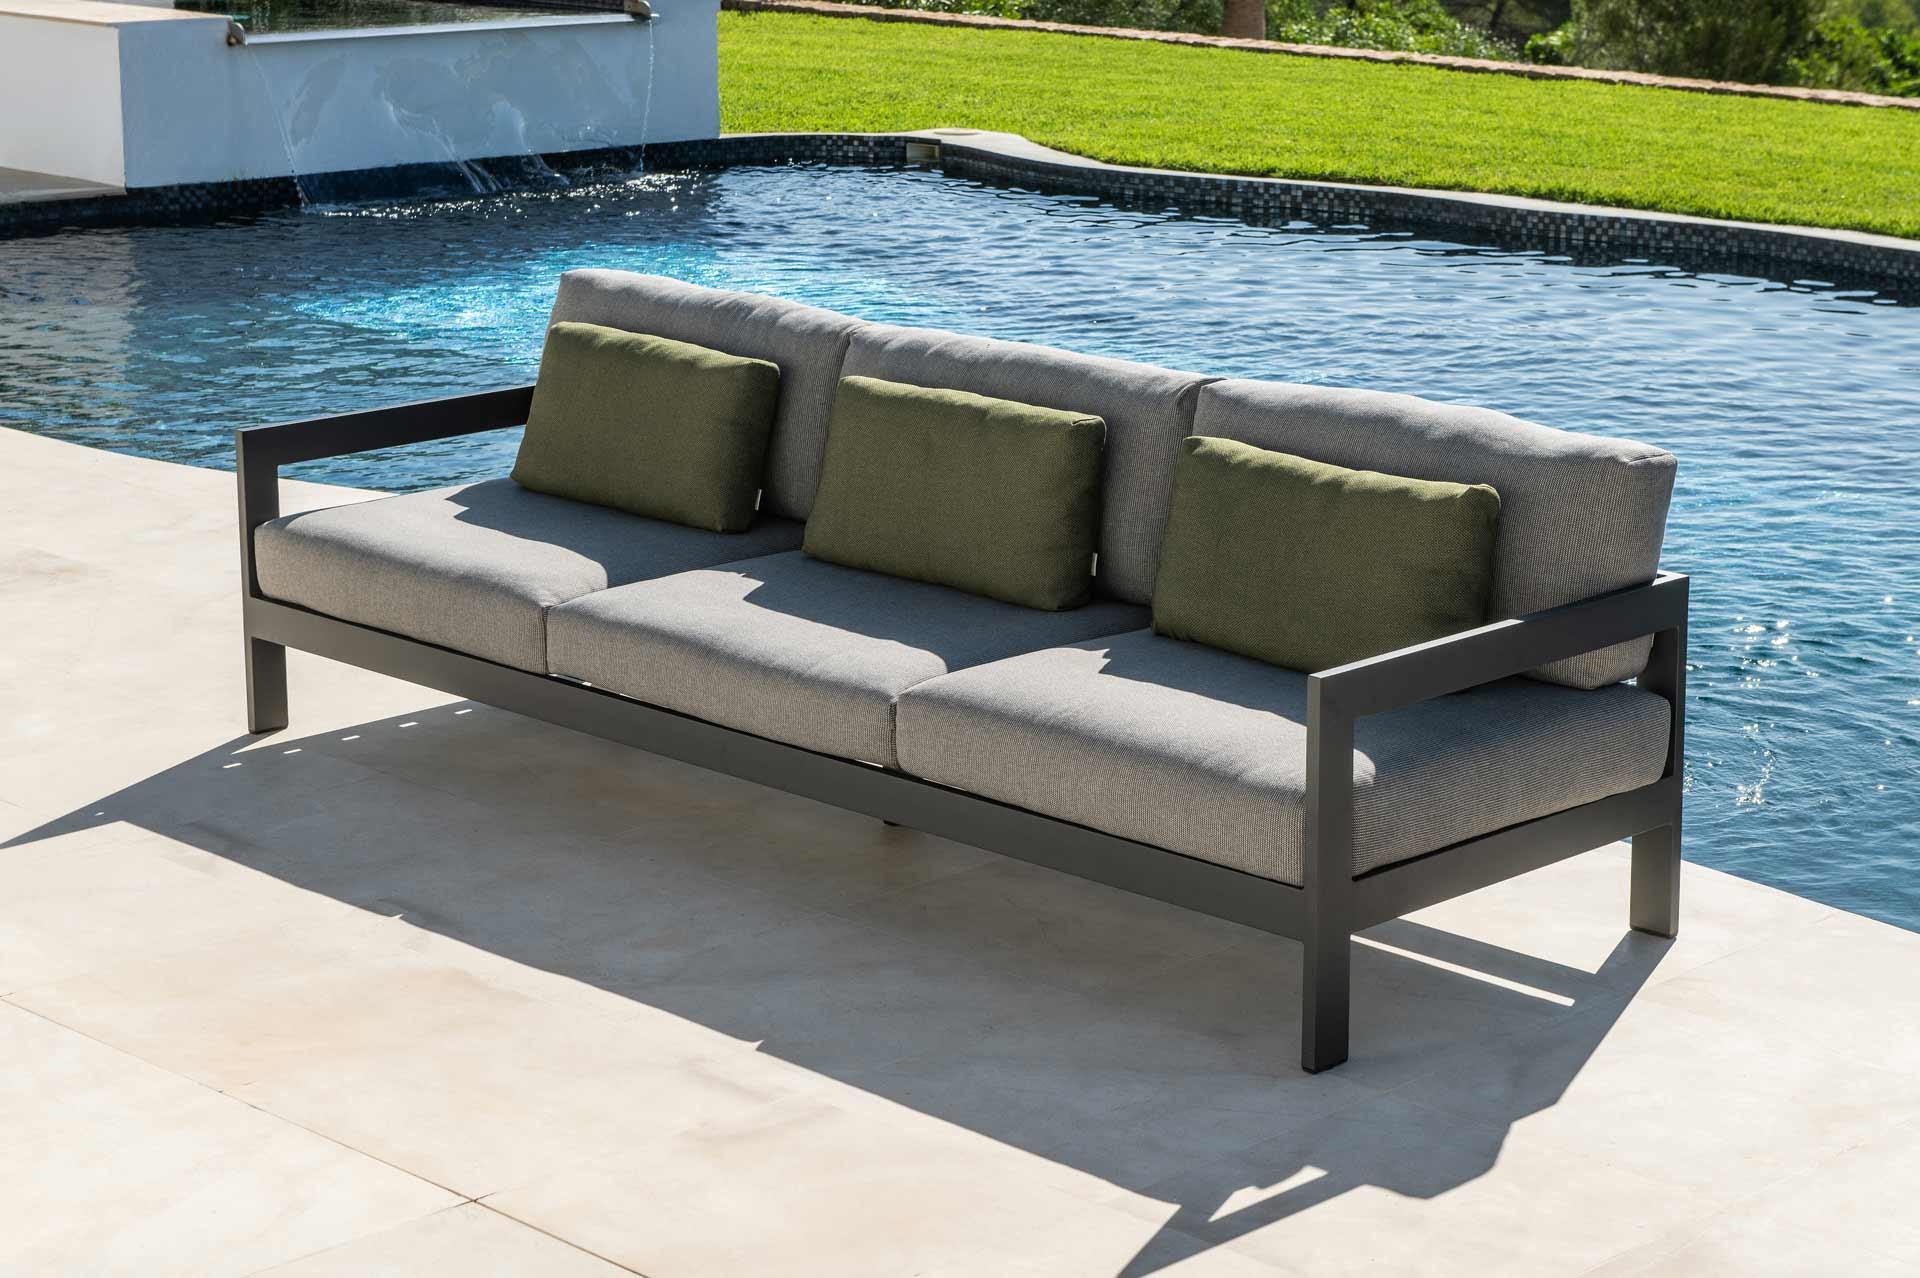 Vigo XL 3-zits lounge sofa